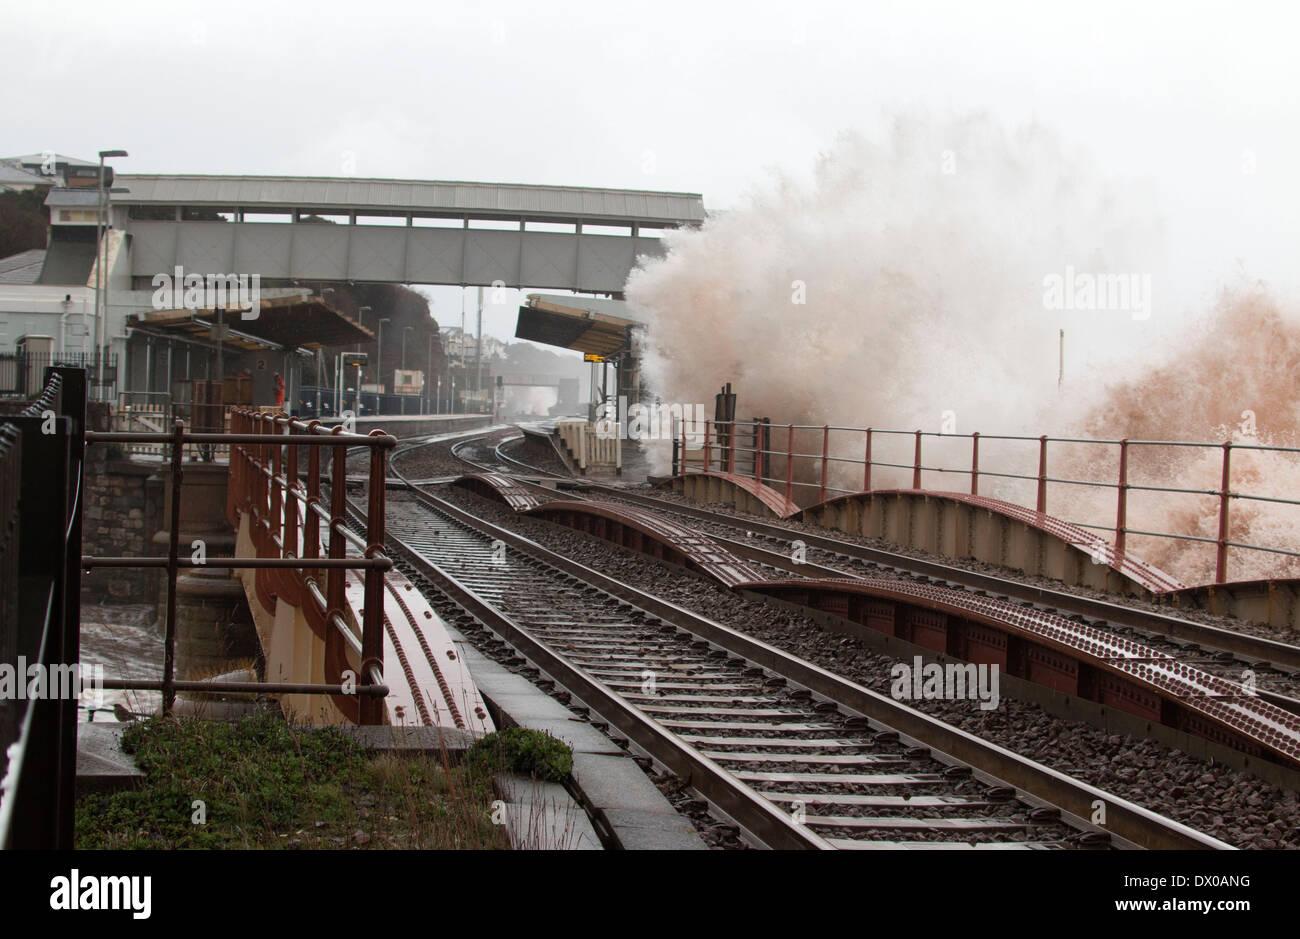 High Tide, Raging Sea Threatens the Railway line at Dawlish. - Stock Image